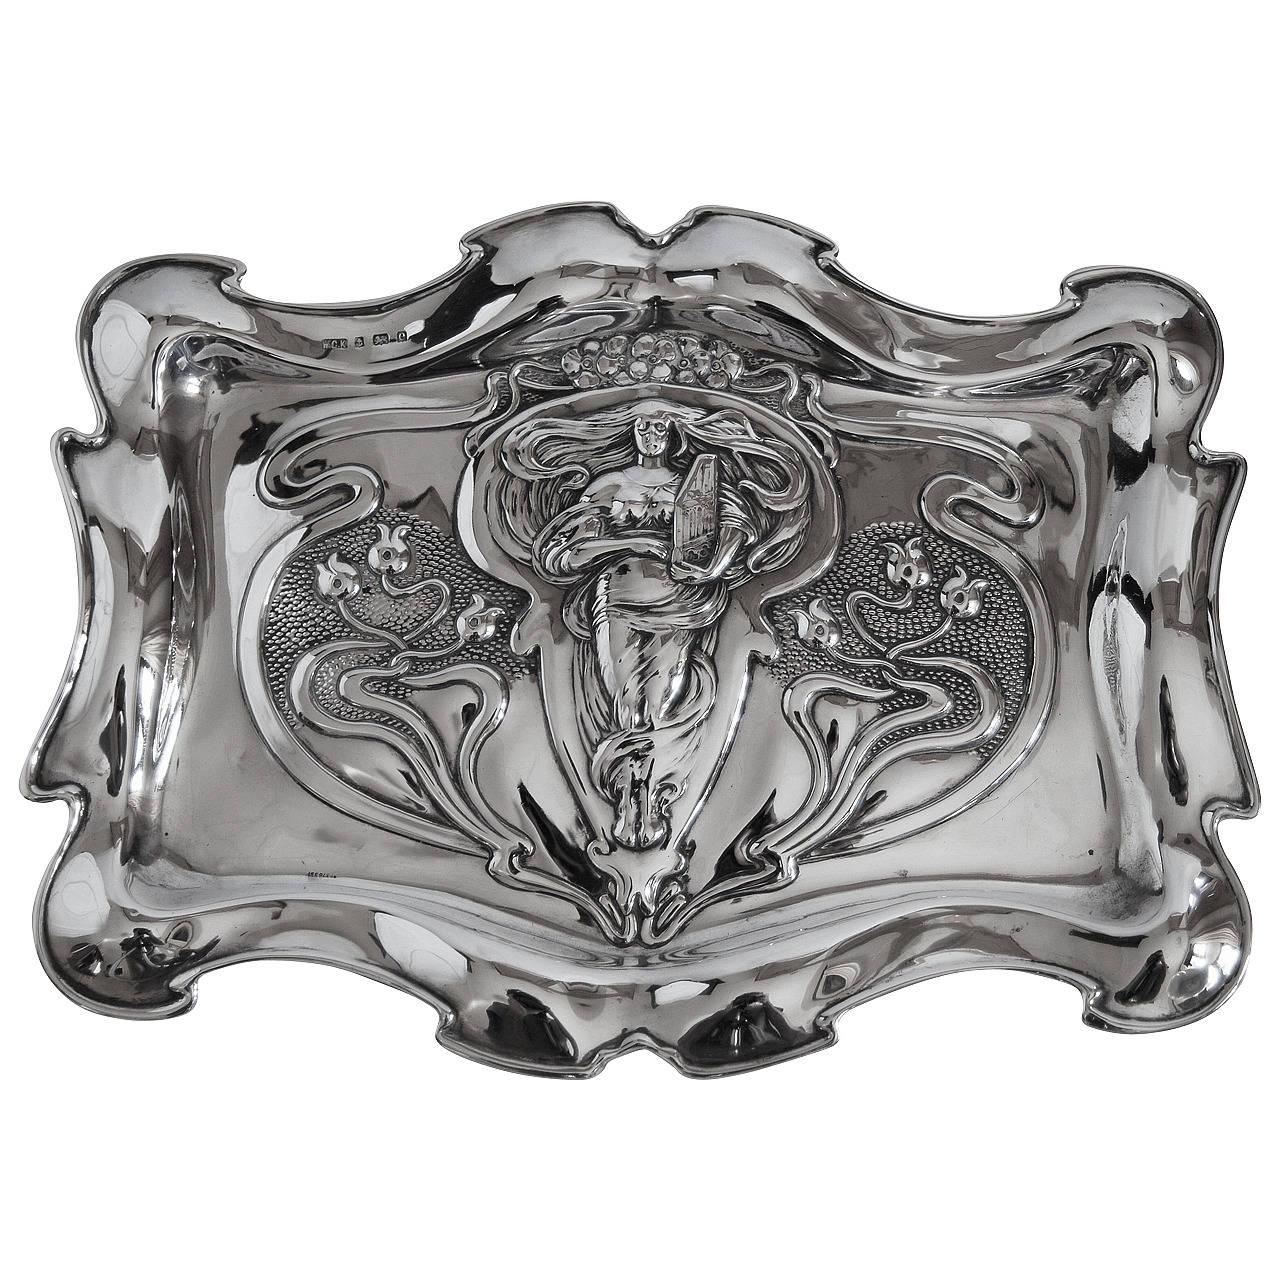 Arts & Crafts English Silver Tray